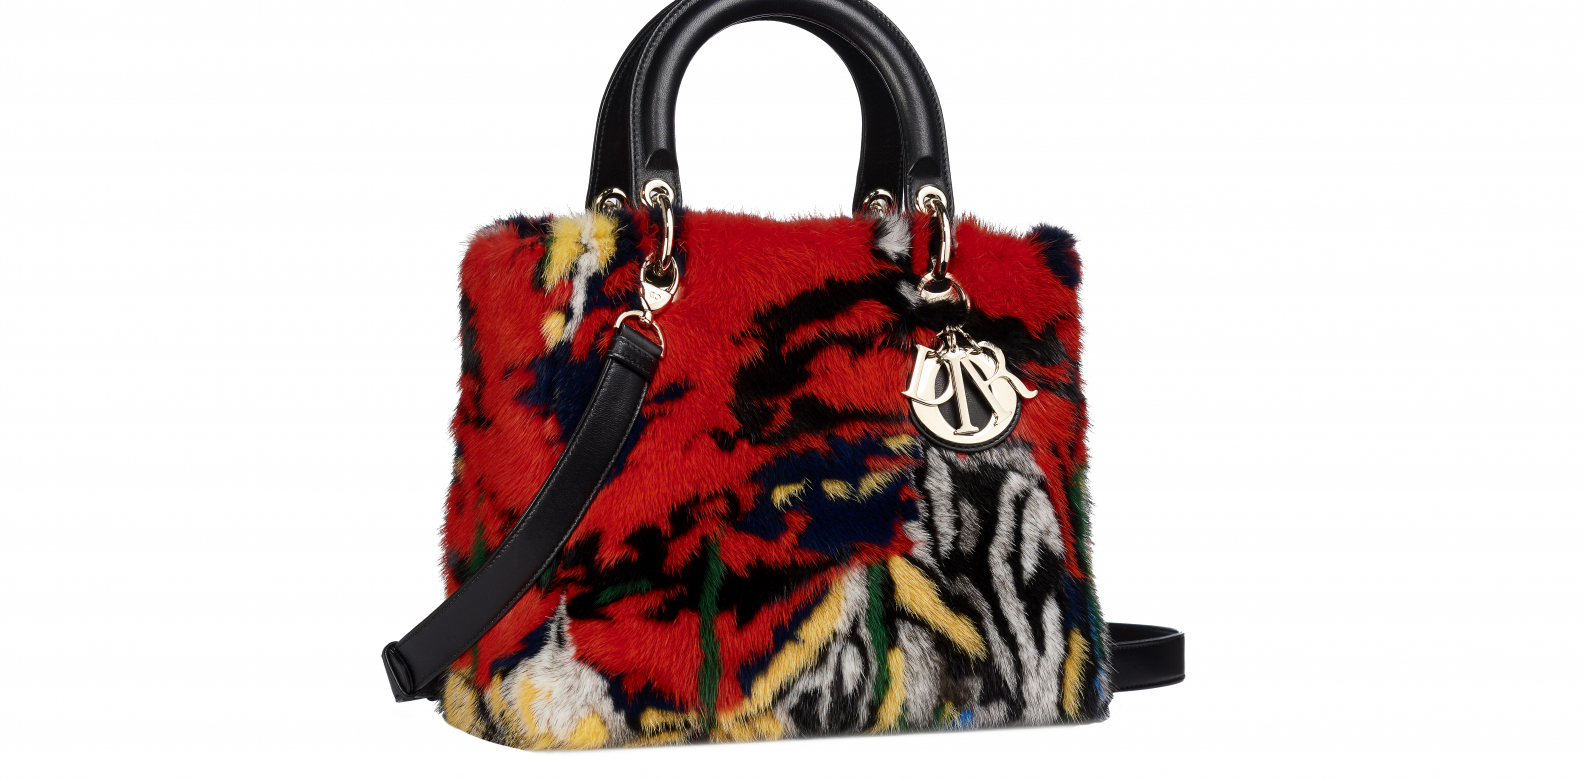 The Lady Dior bag designed by Namsa Leuba - Dior Lady Art #2. Photo courtesy of Frederic Leclere